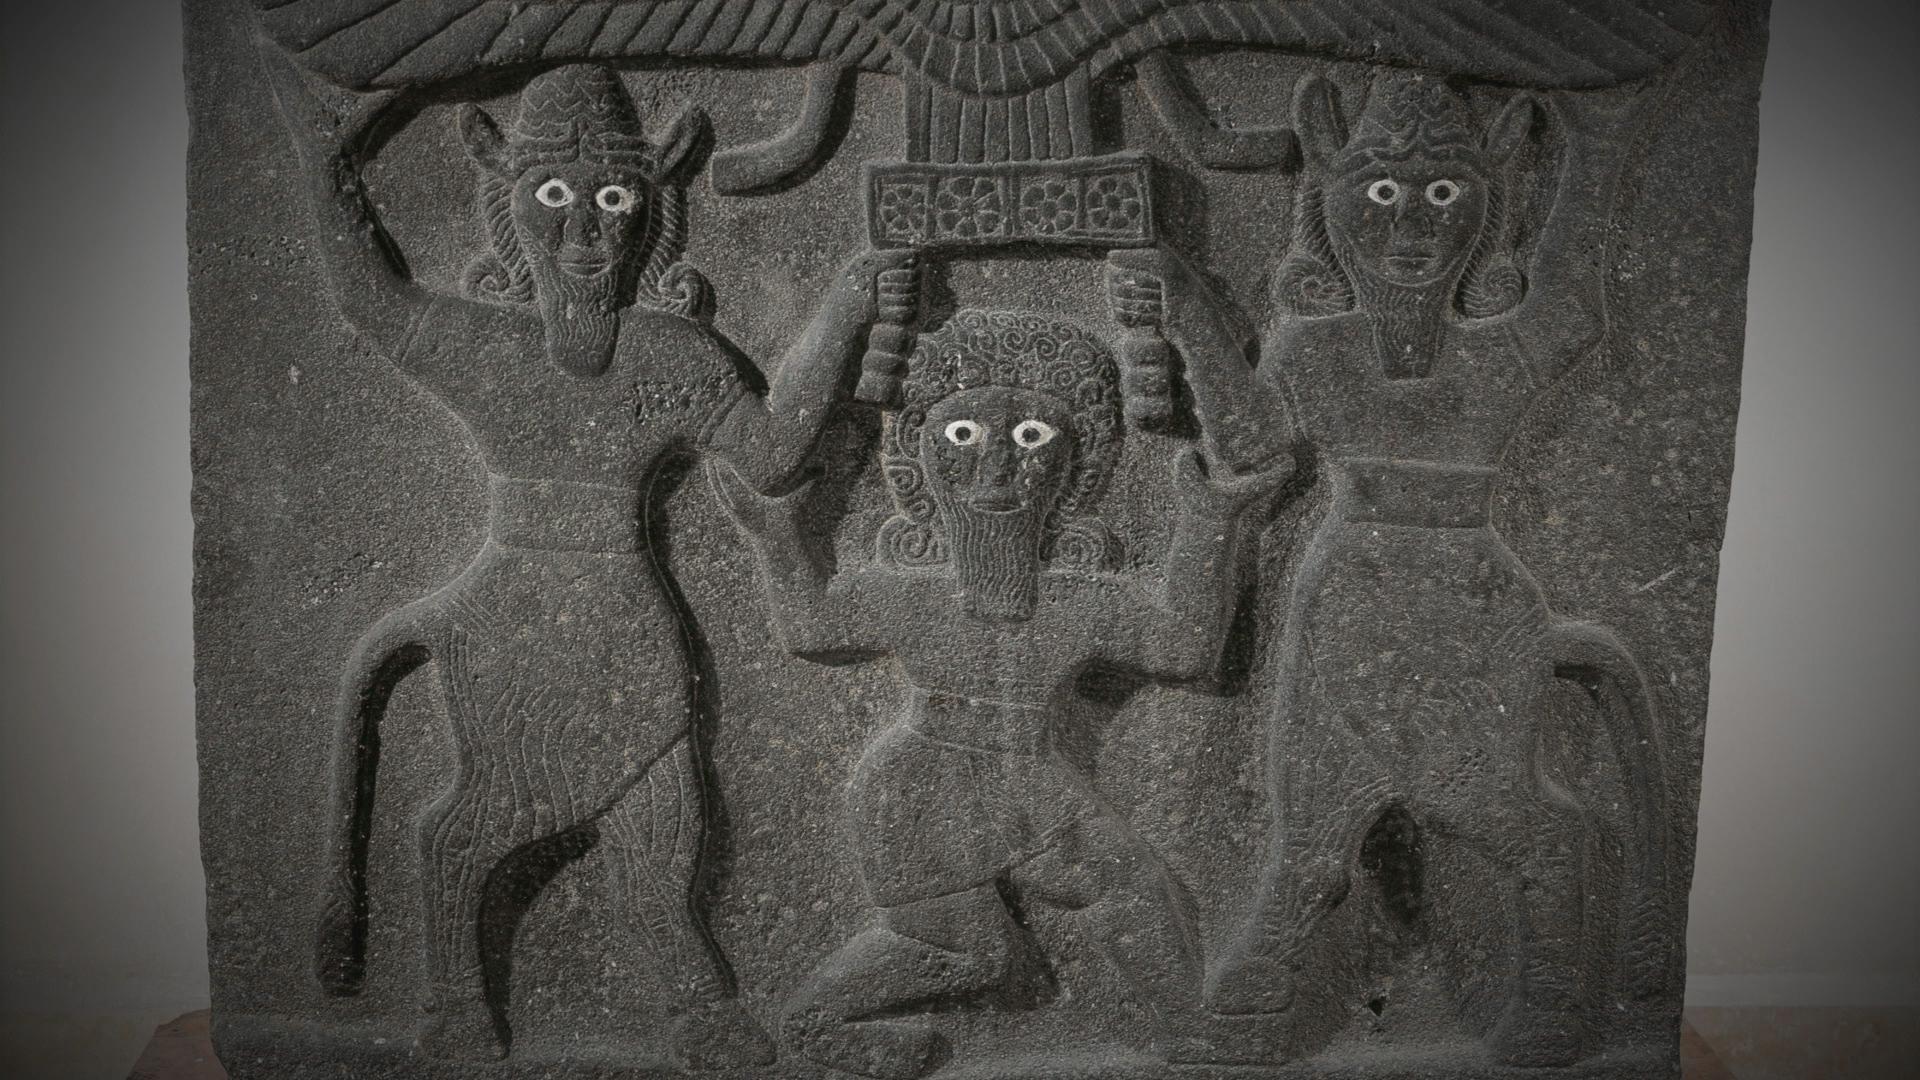 Ancient Aliens : The Prototypes